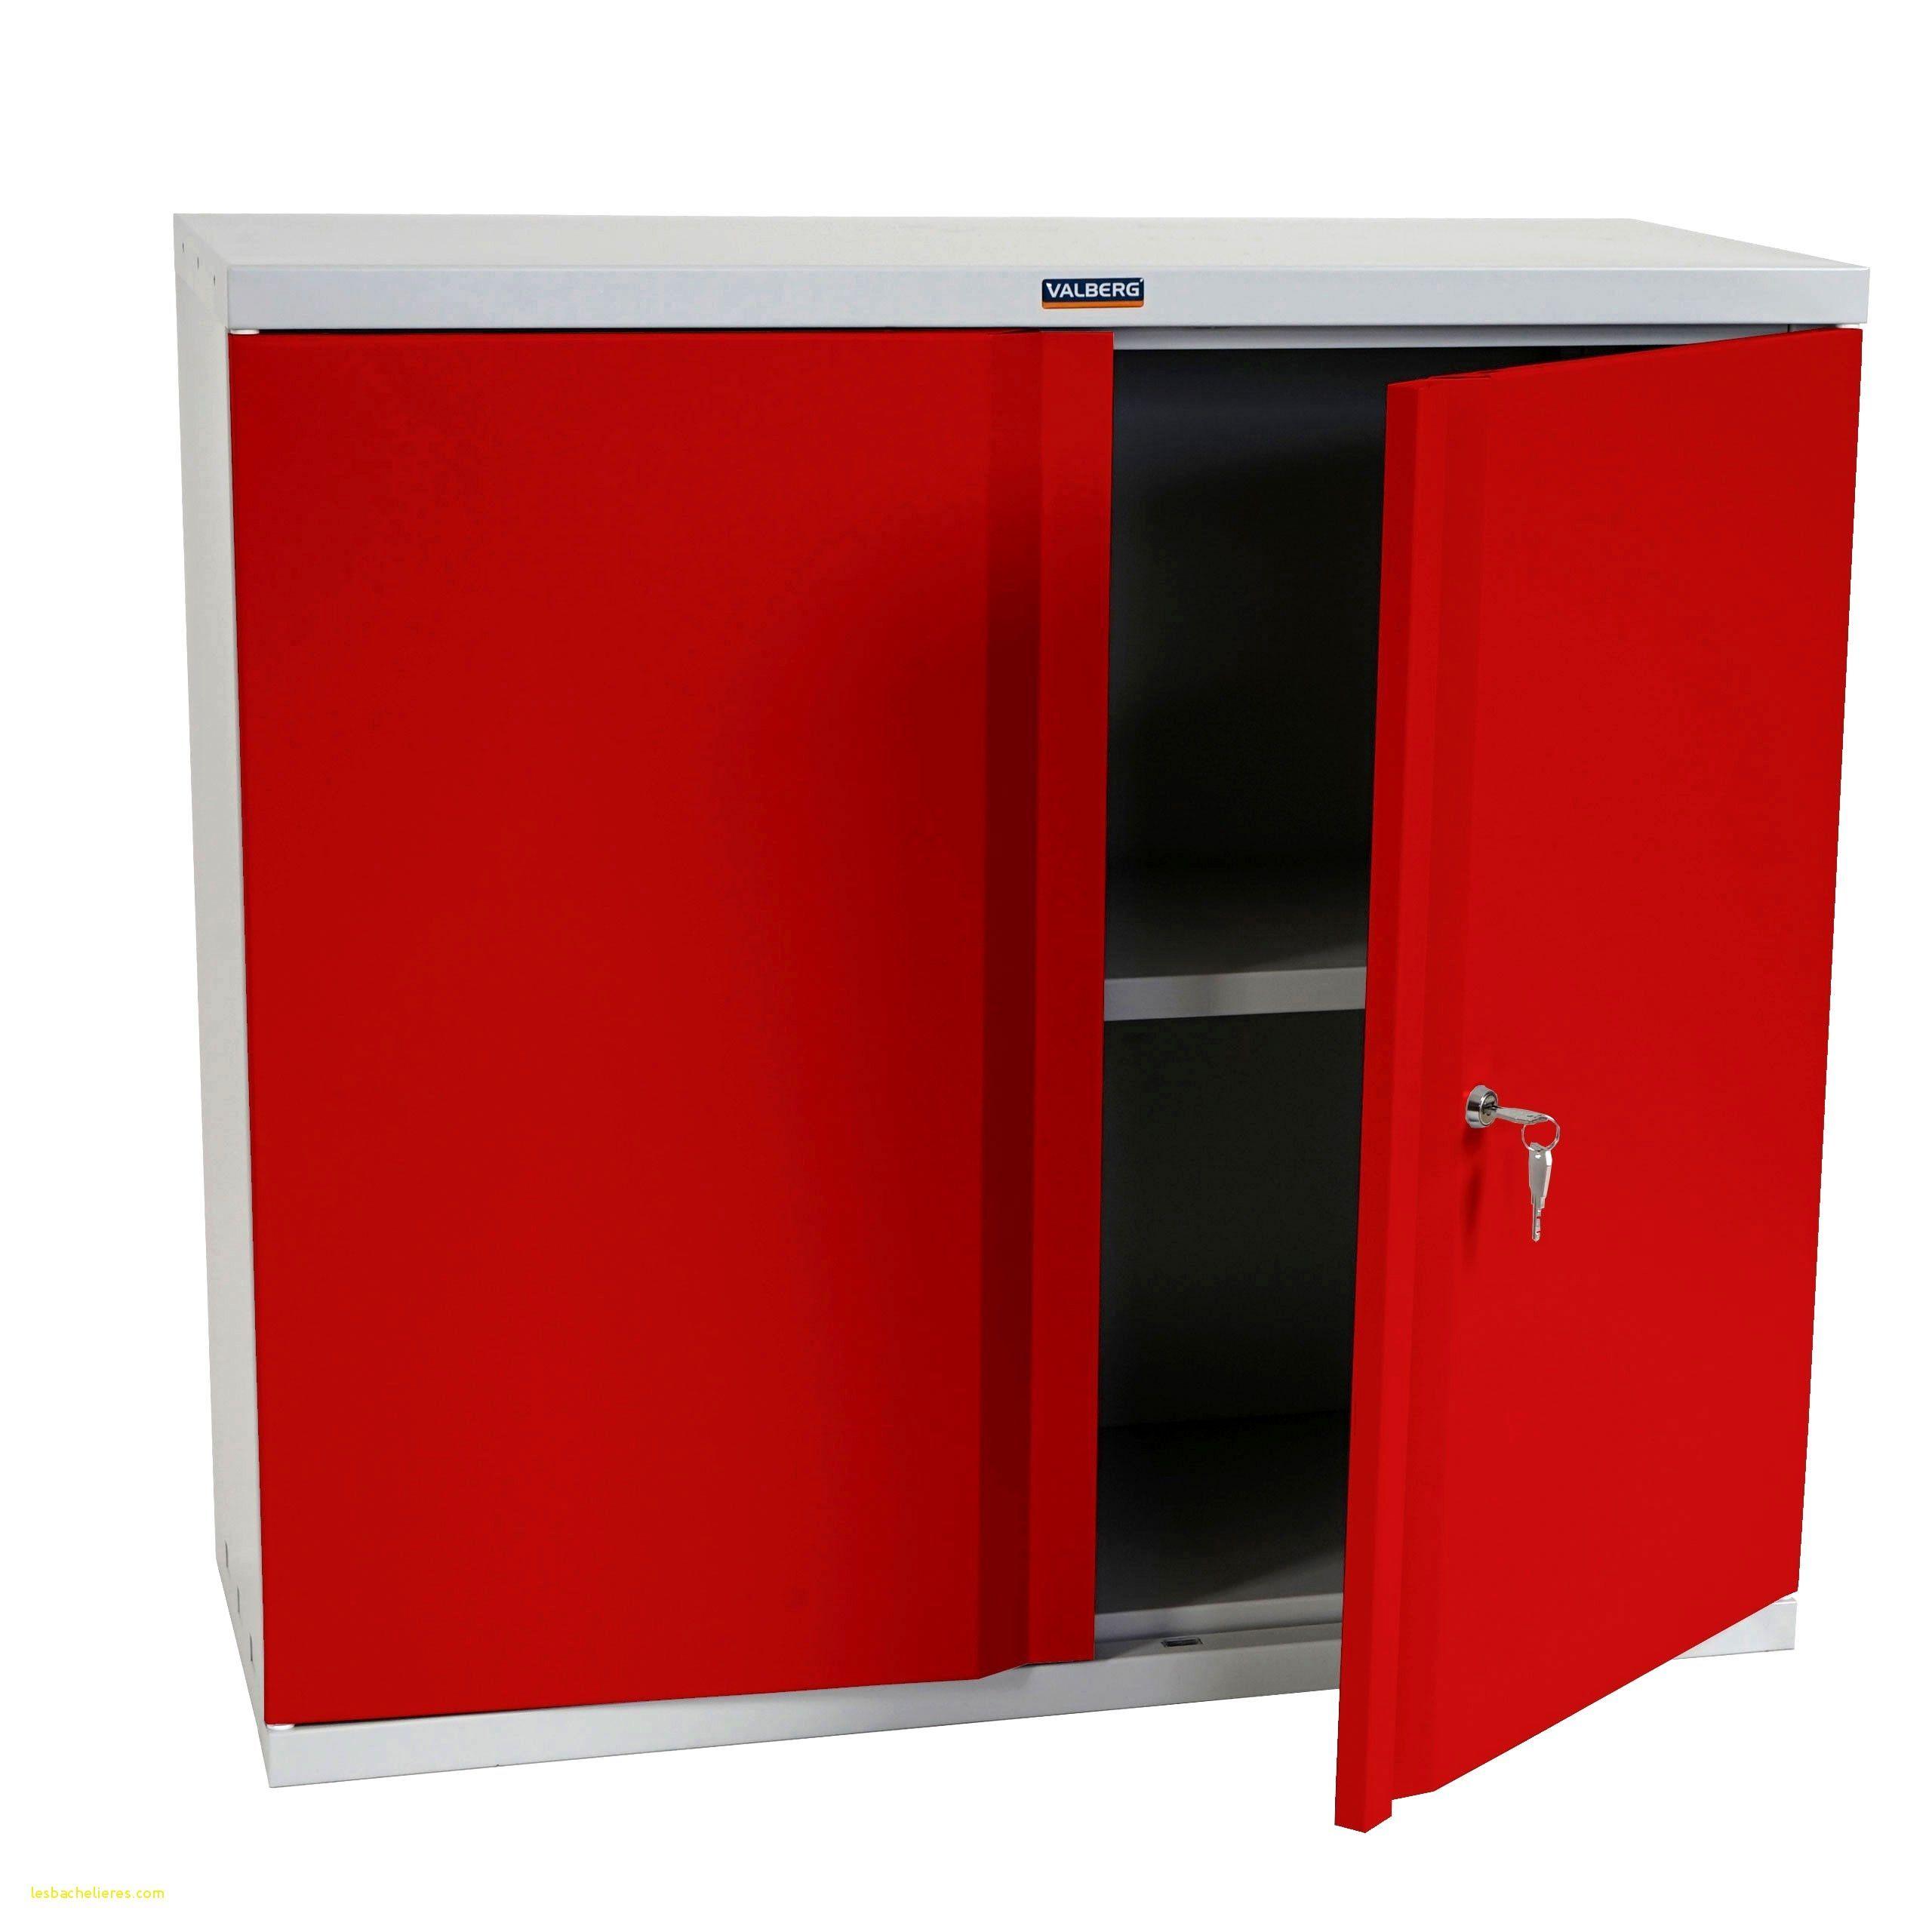 Armoire Vestiaire Metallique Ikea Armoire Vestiaire Metallique